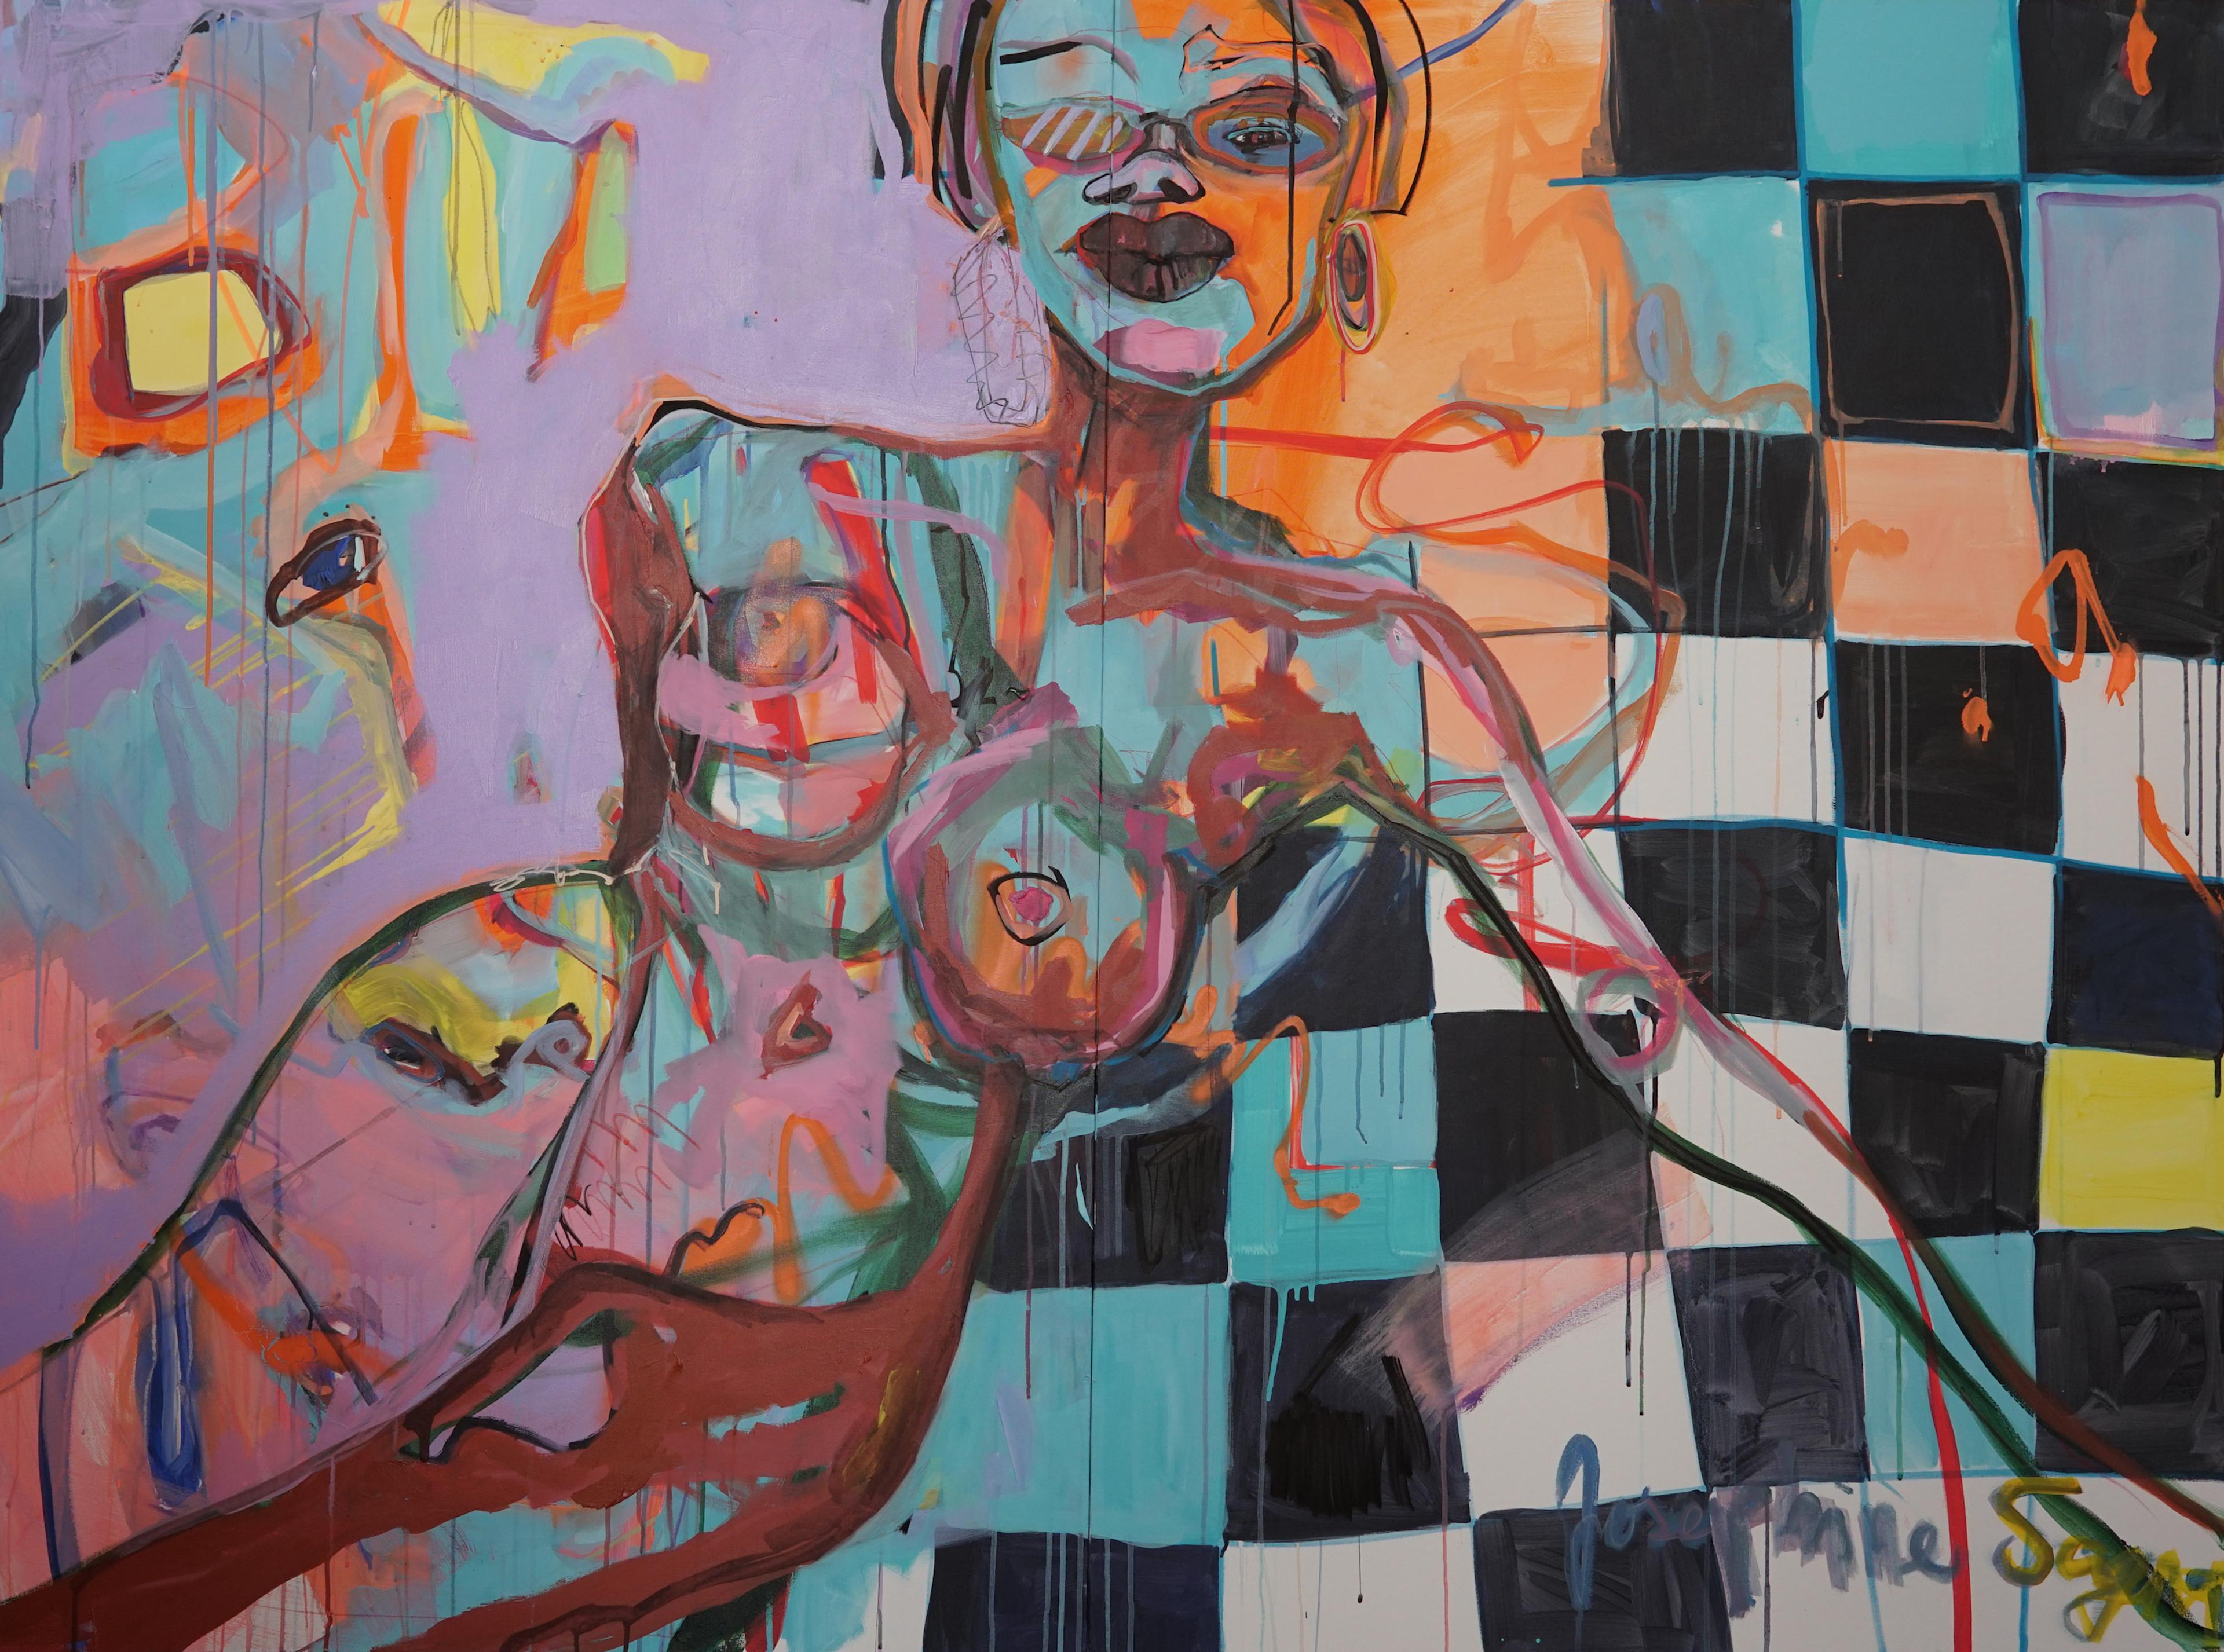 artwork bloom some more by Joséphine Sagna